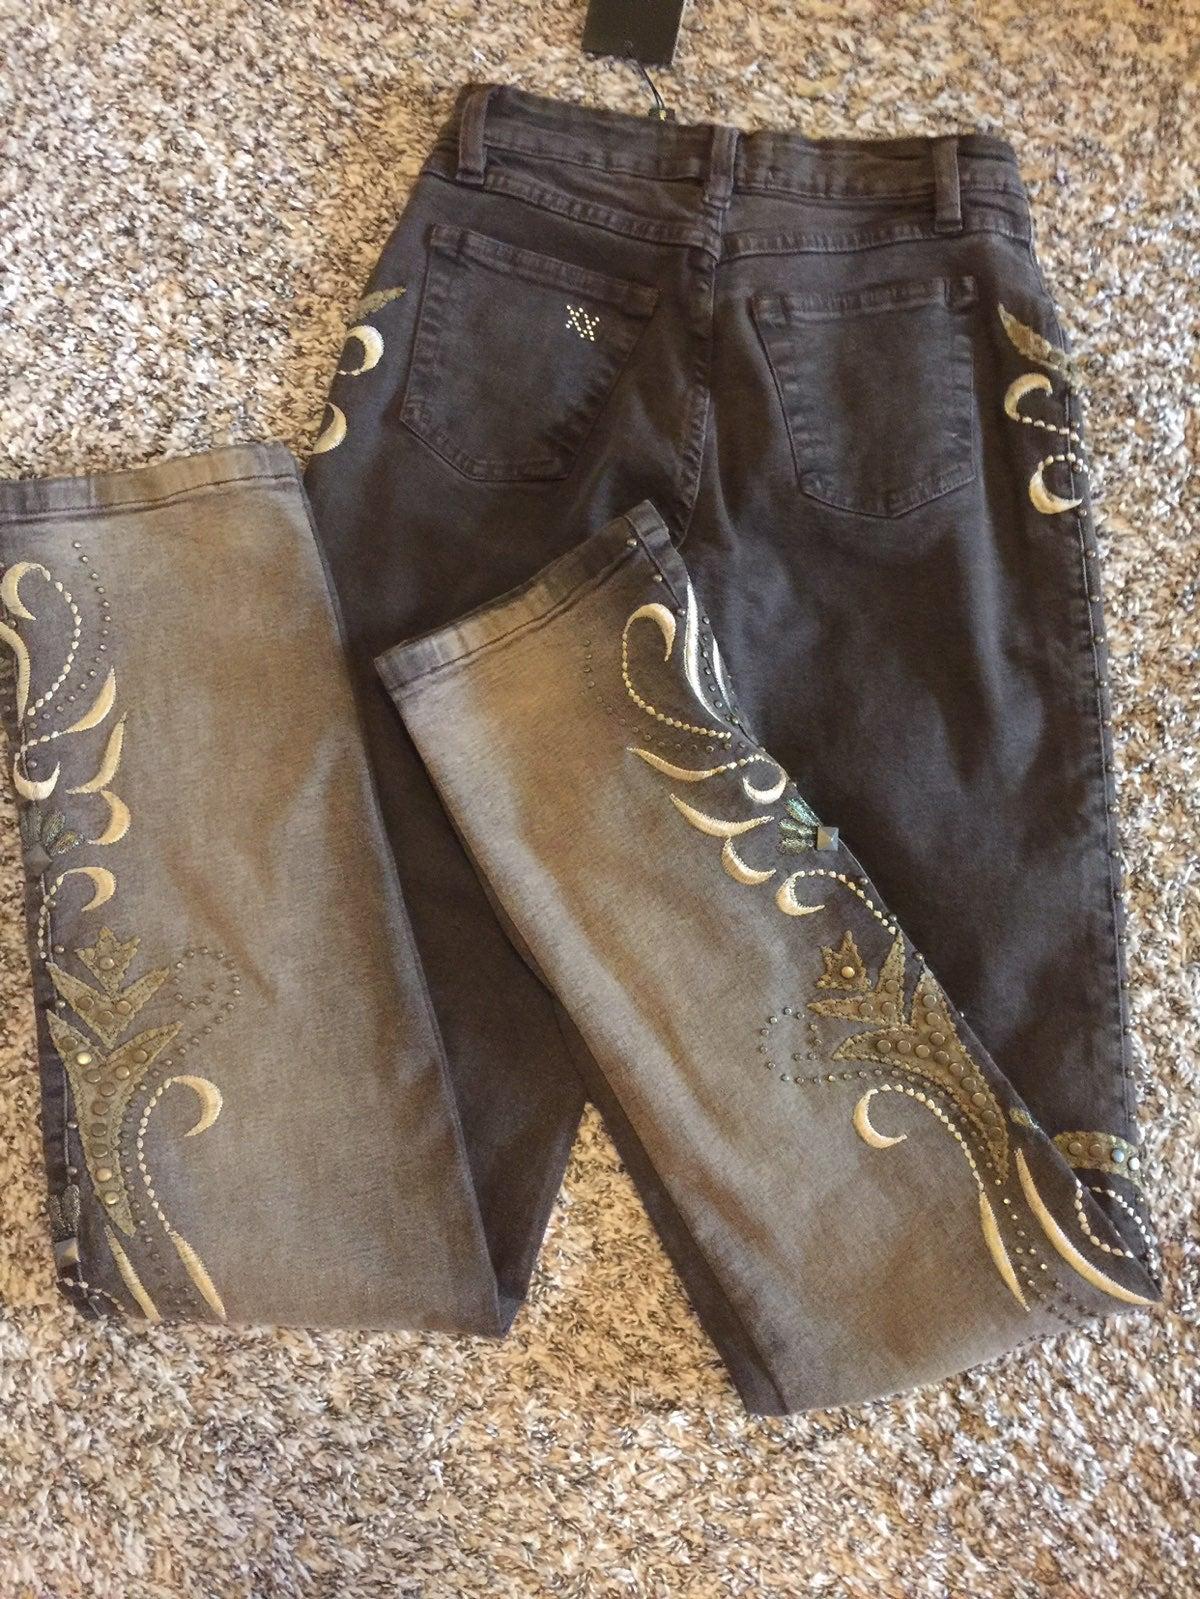 NWT Brazilroxx Jeans Emblished Jeans 2